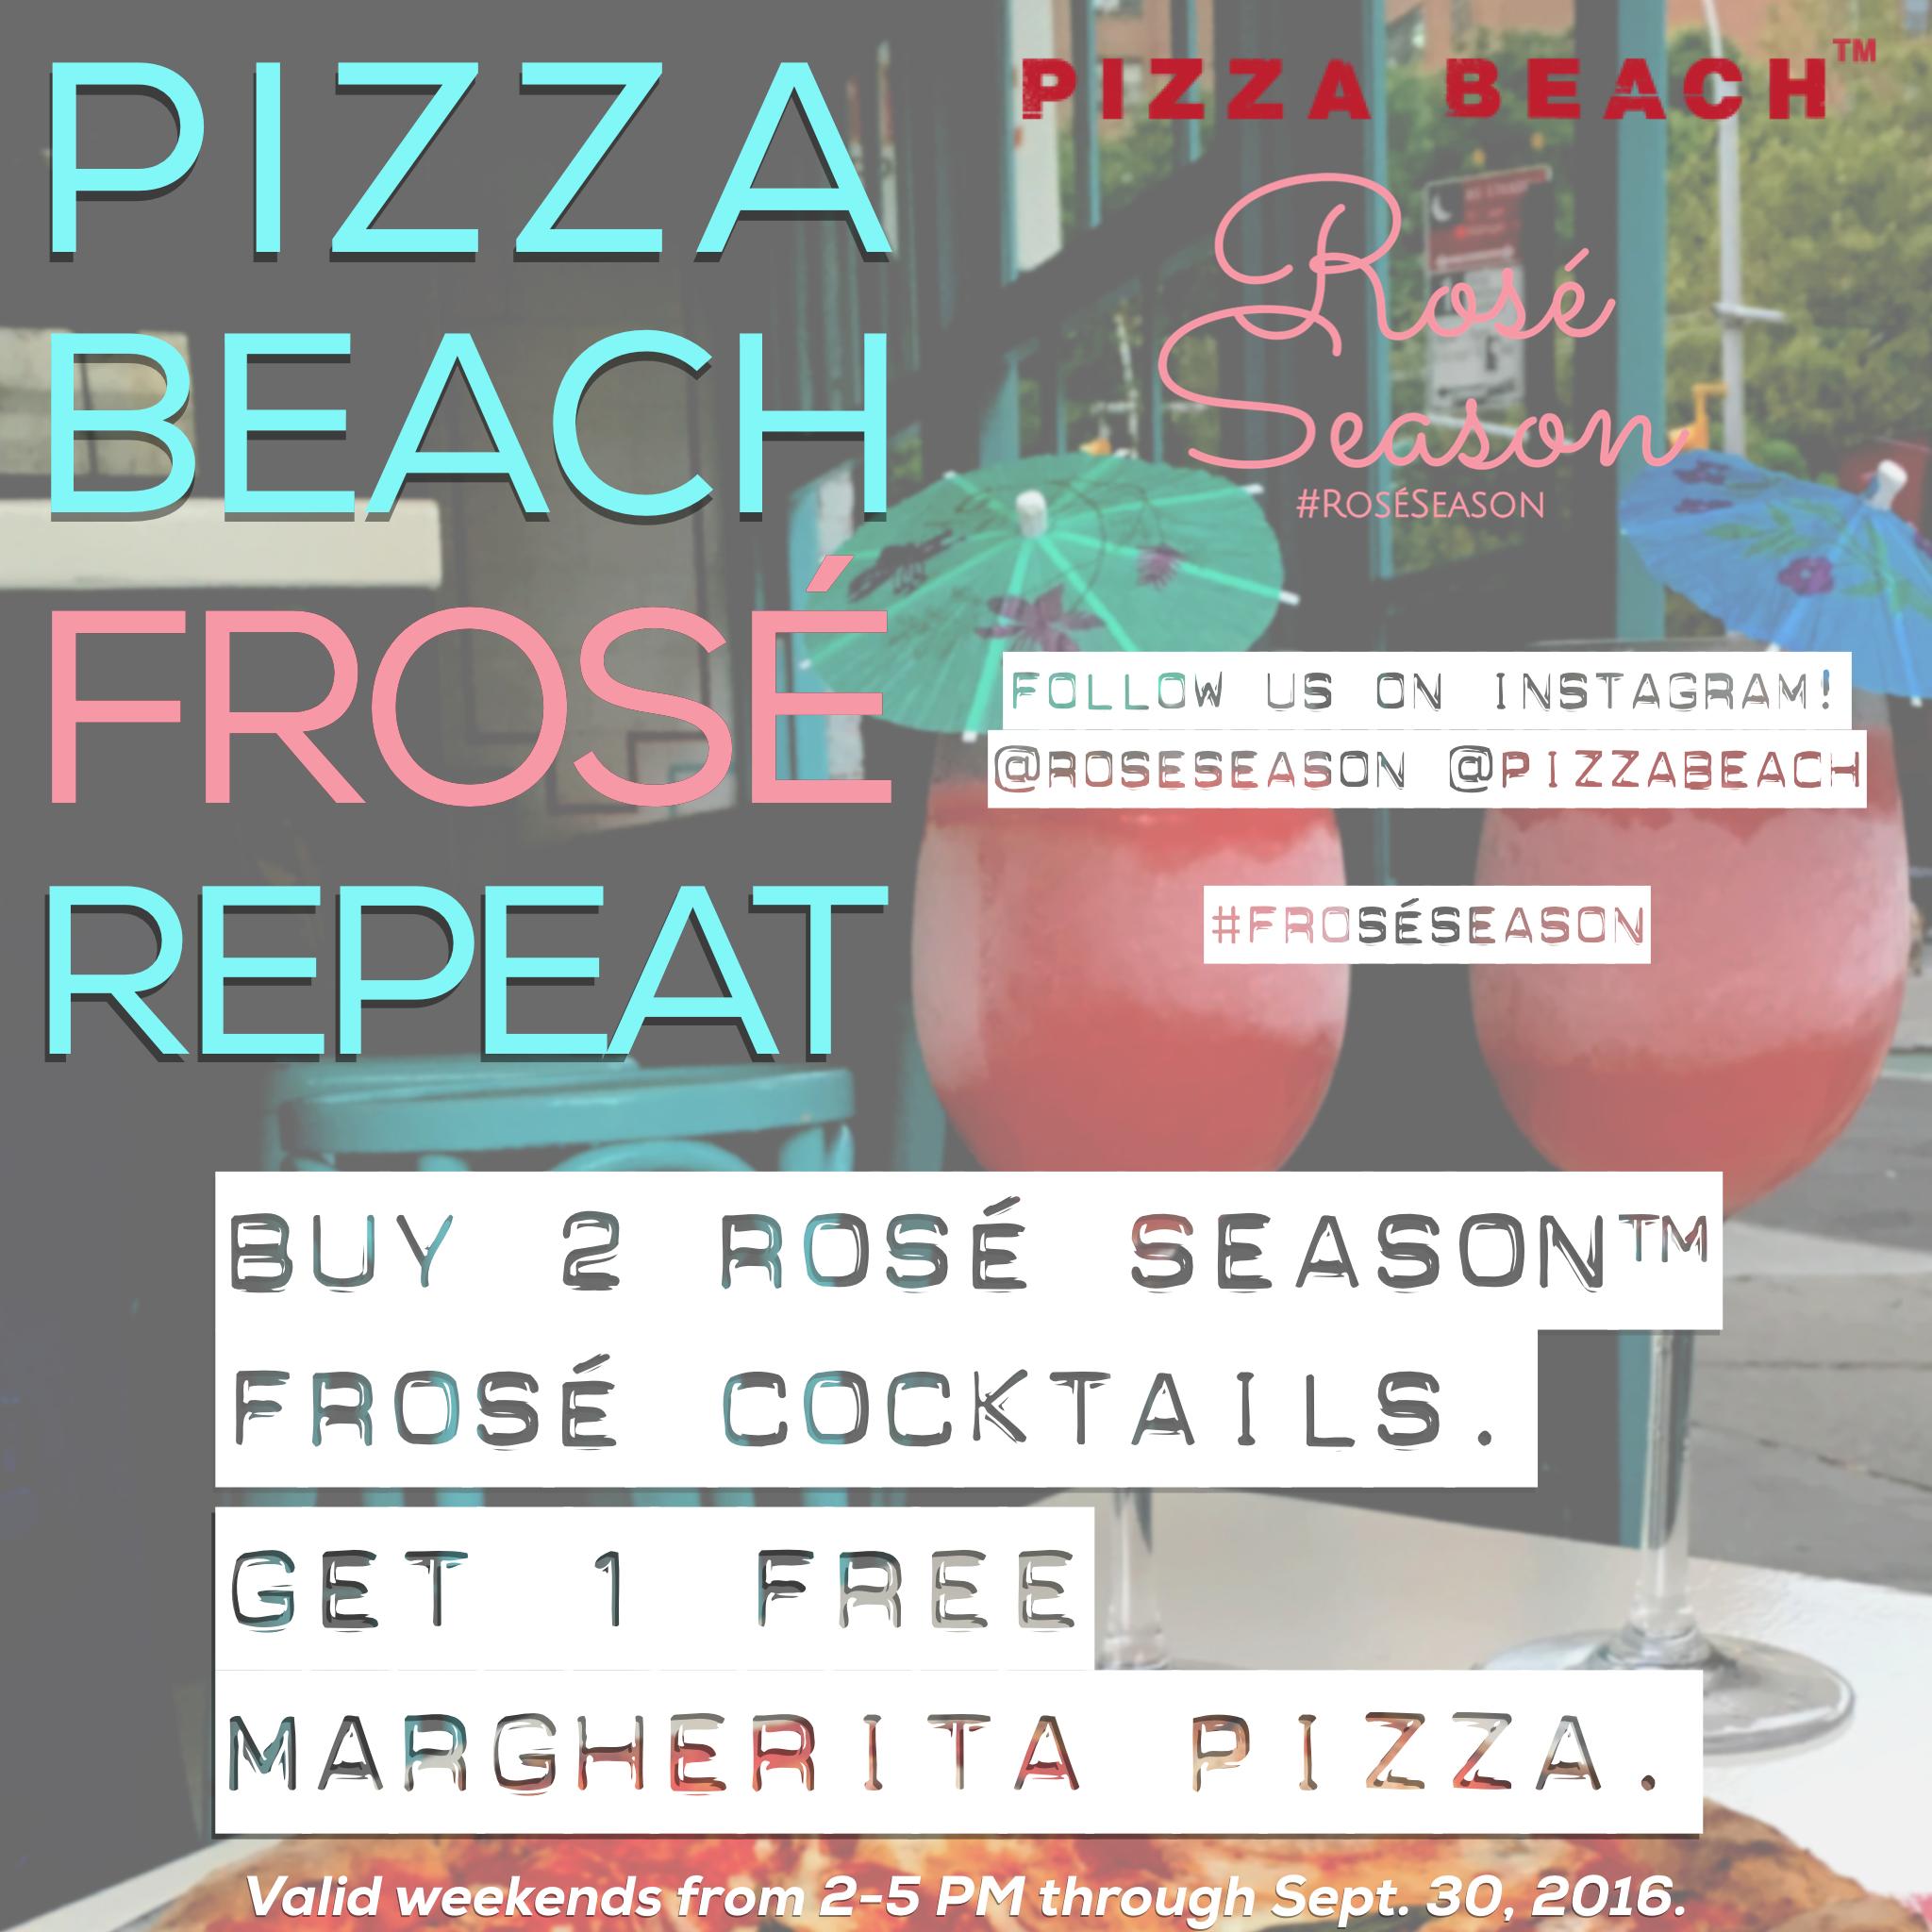 Frosé Season at Pizza Beach